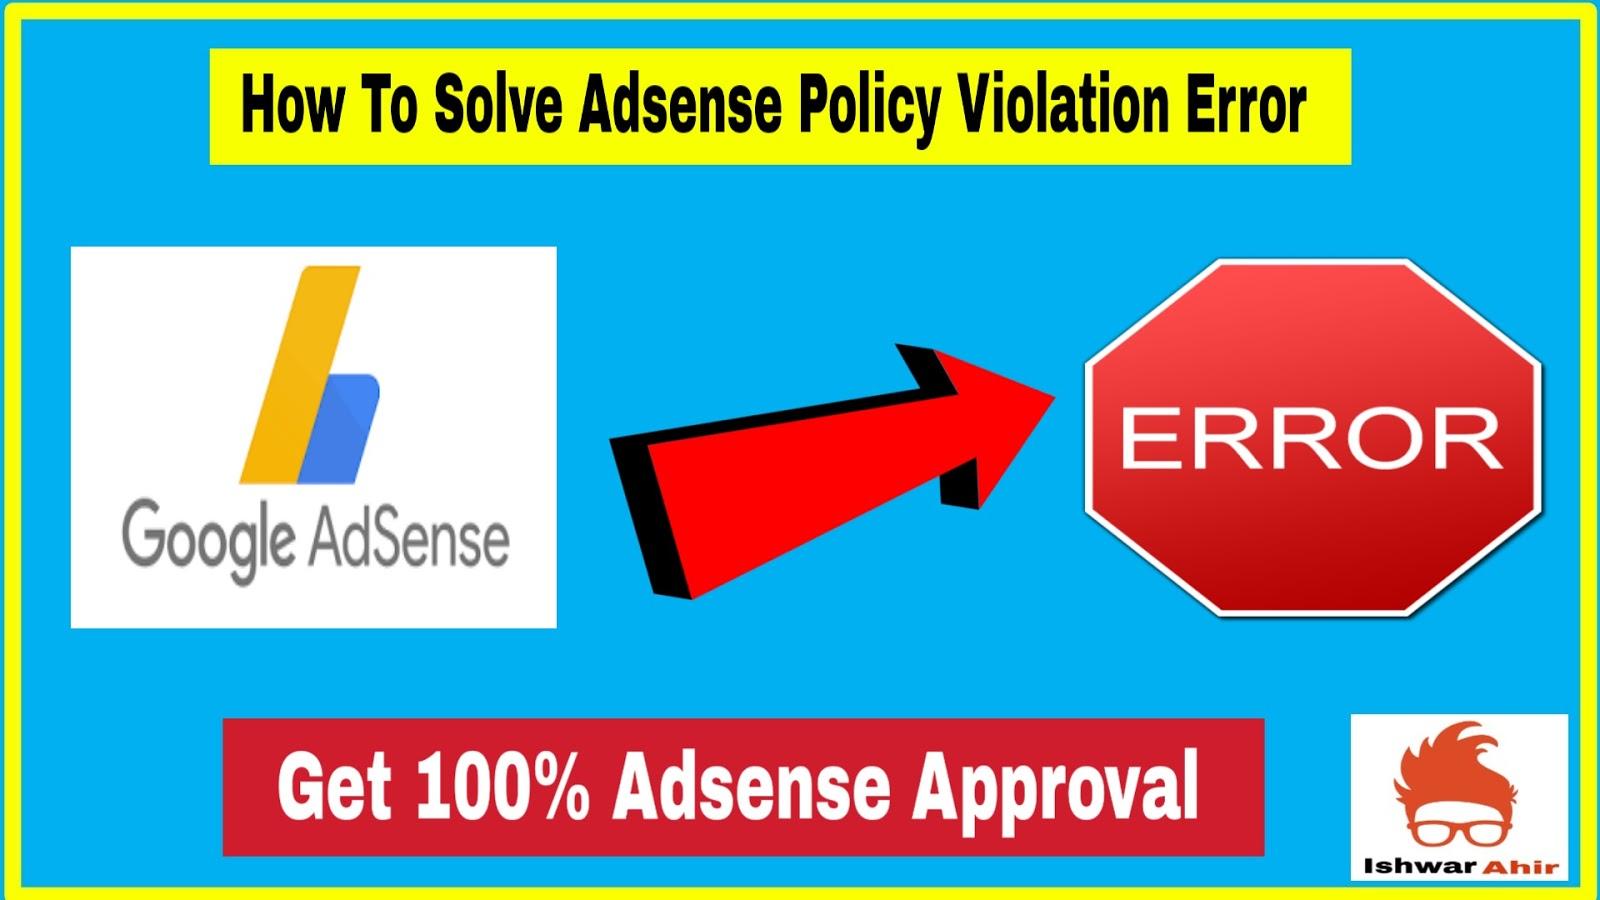 How to Solve Adsense Policy Violation Error